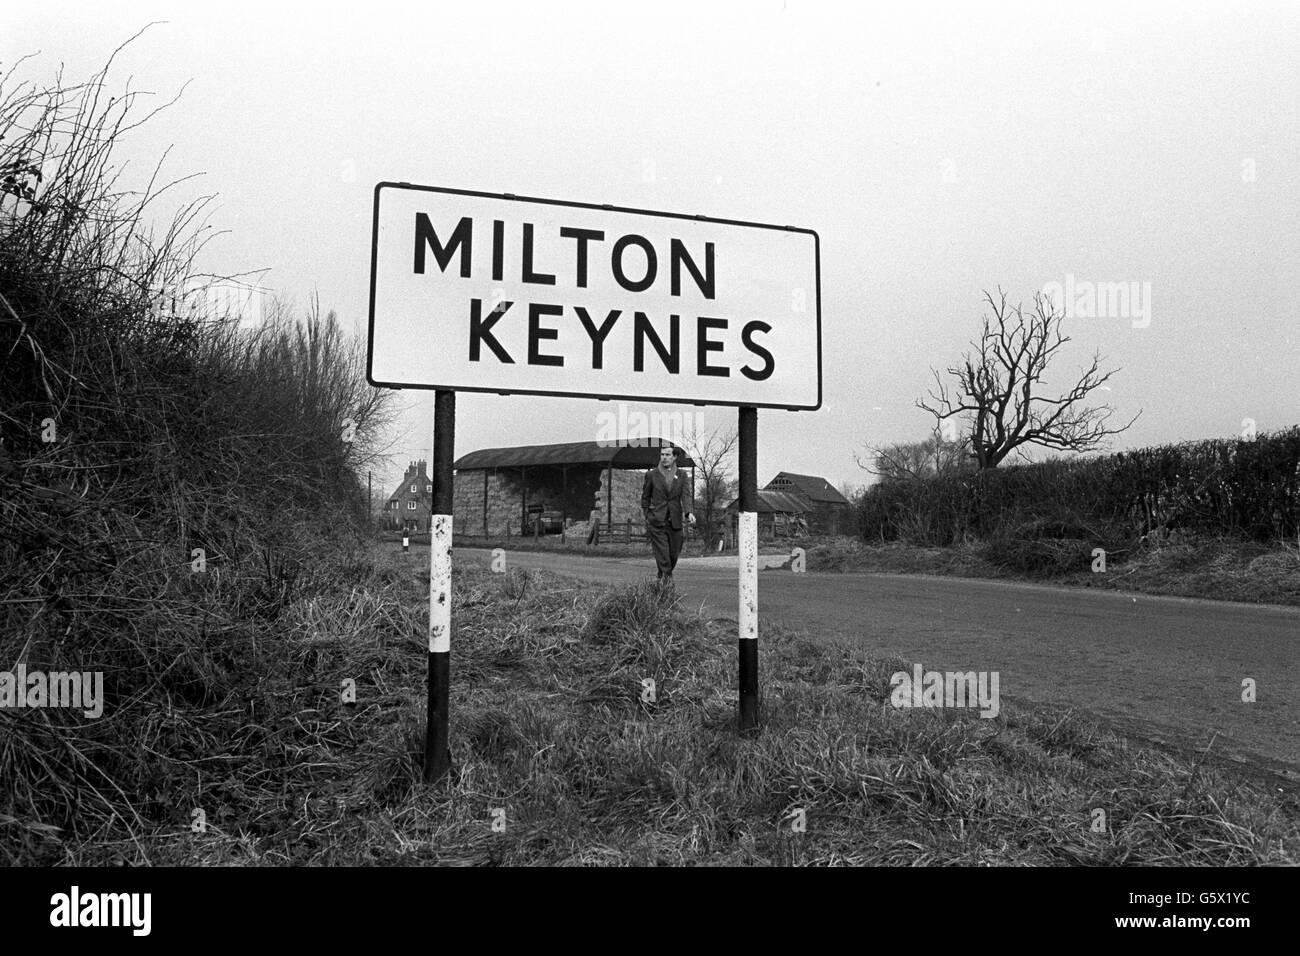 Milton Keynes Road Sign Stock Photos Amp Milton Keynes Road